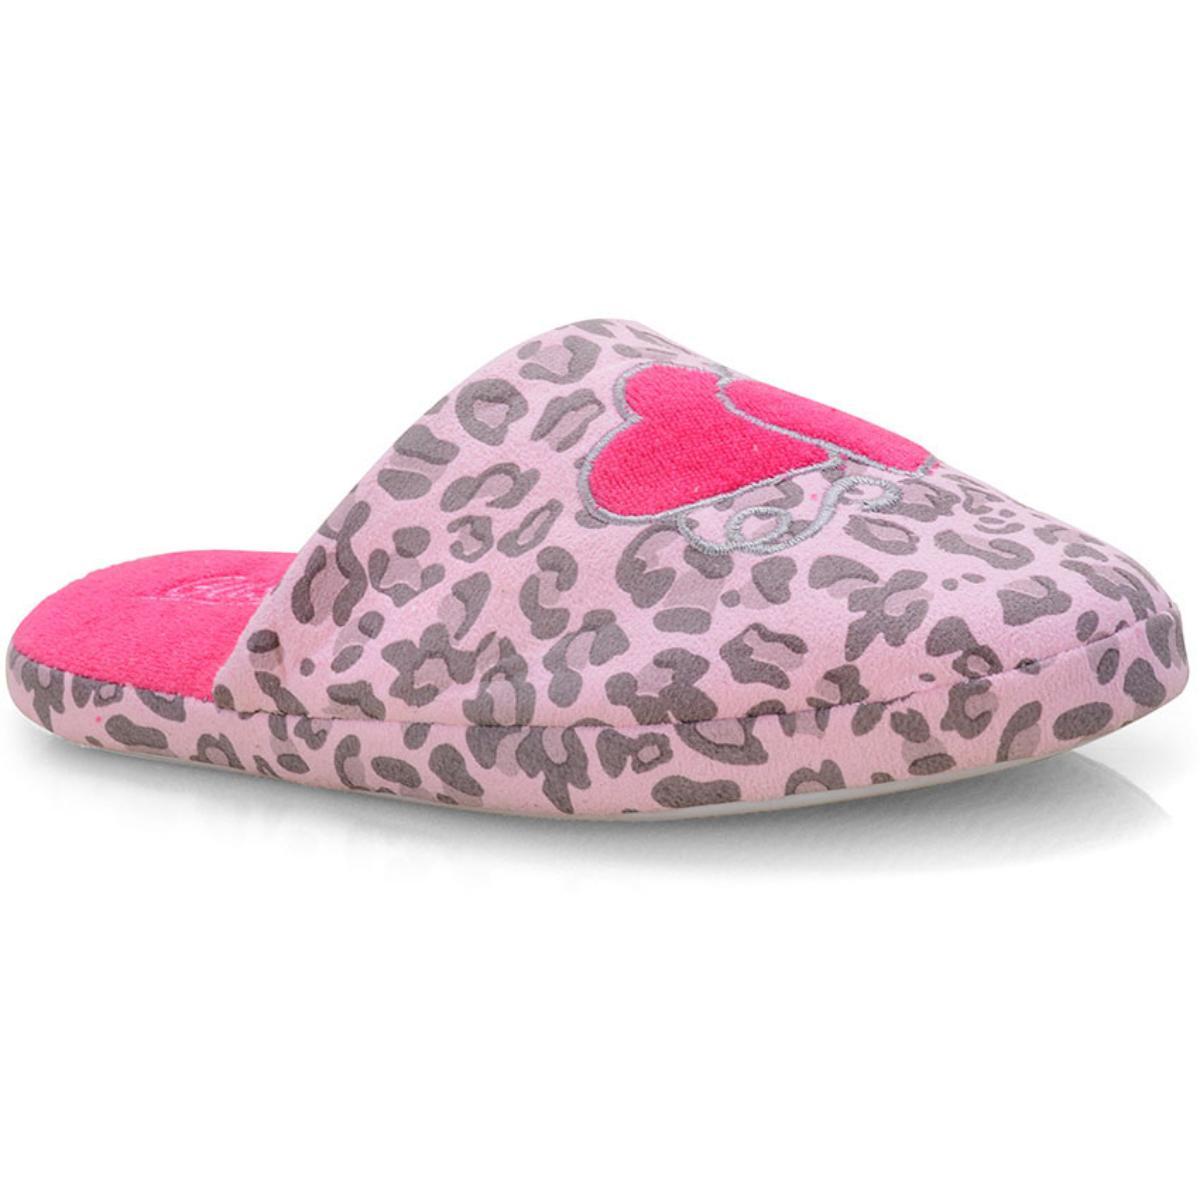 Chinelo Feminino Gasf 143509 Cinza/pink